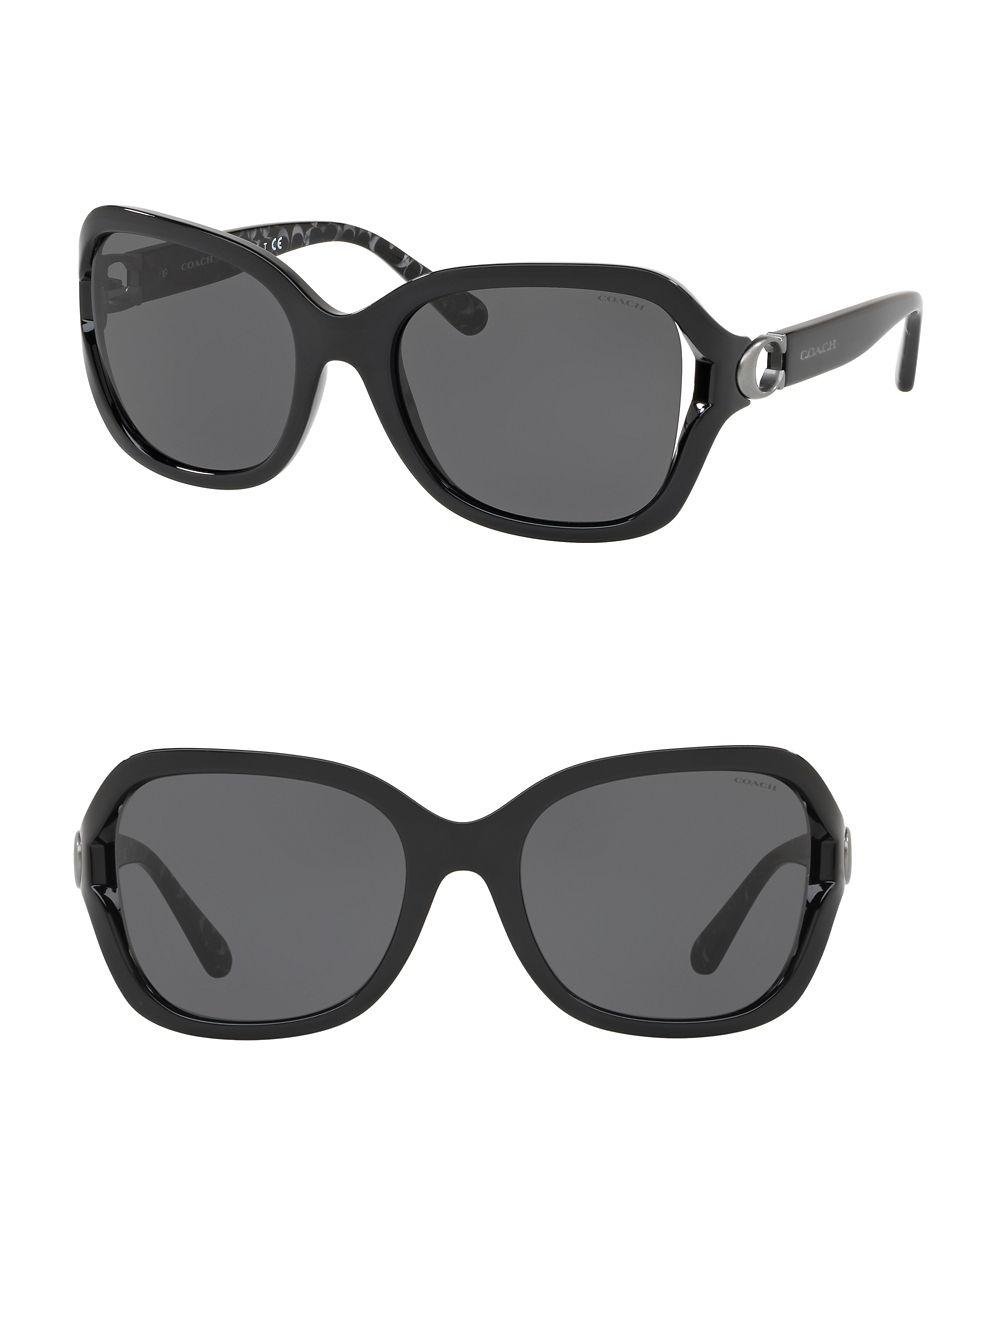 2256f87817dd COACH 57mm Square Sunglasses in Black - Lyst